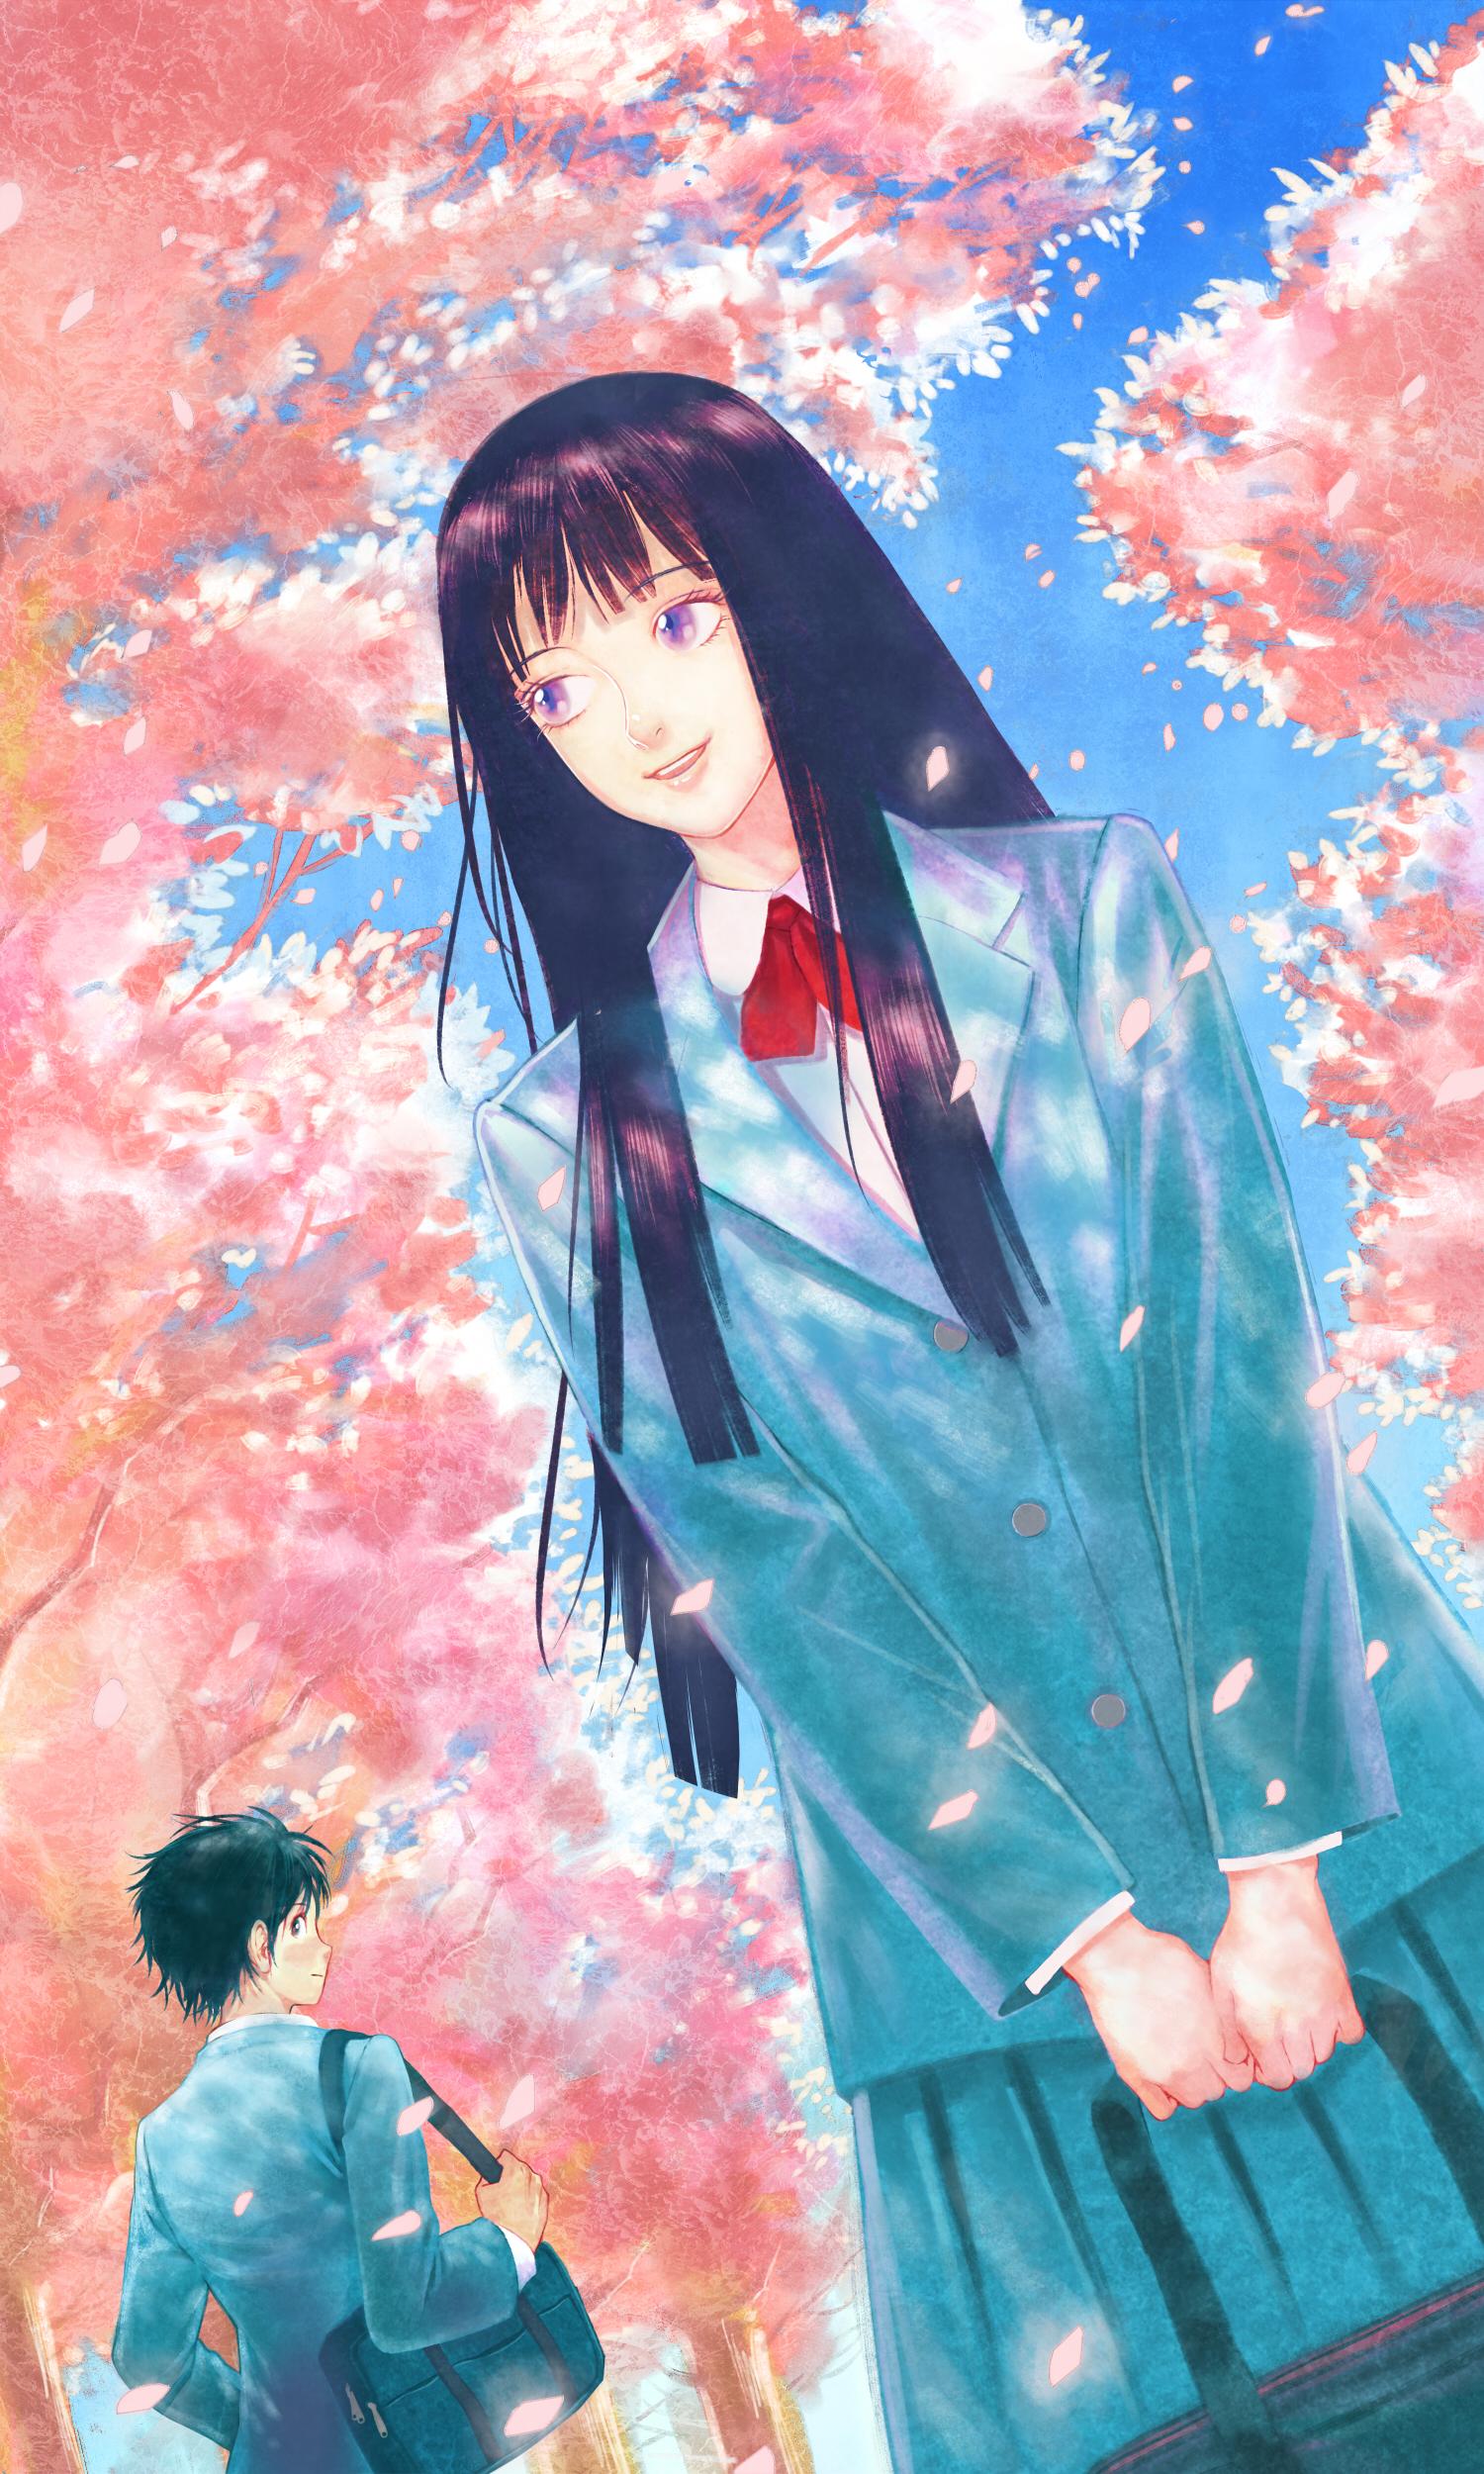 Kimi Ni Todoke From Me To You Mobile Wallpaper 333218 Zerochan